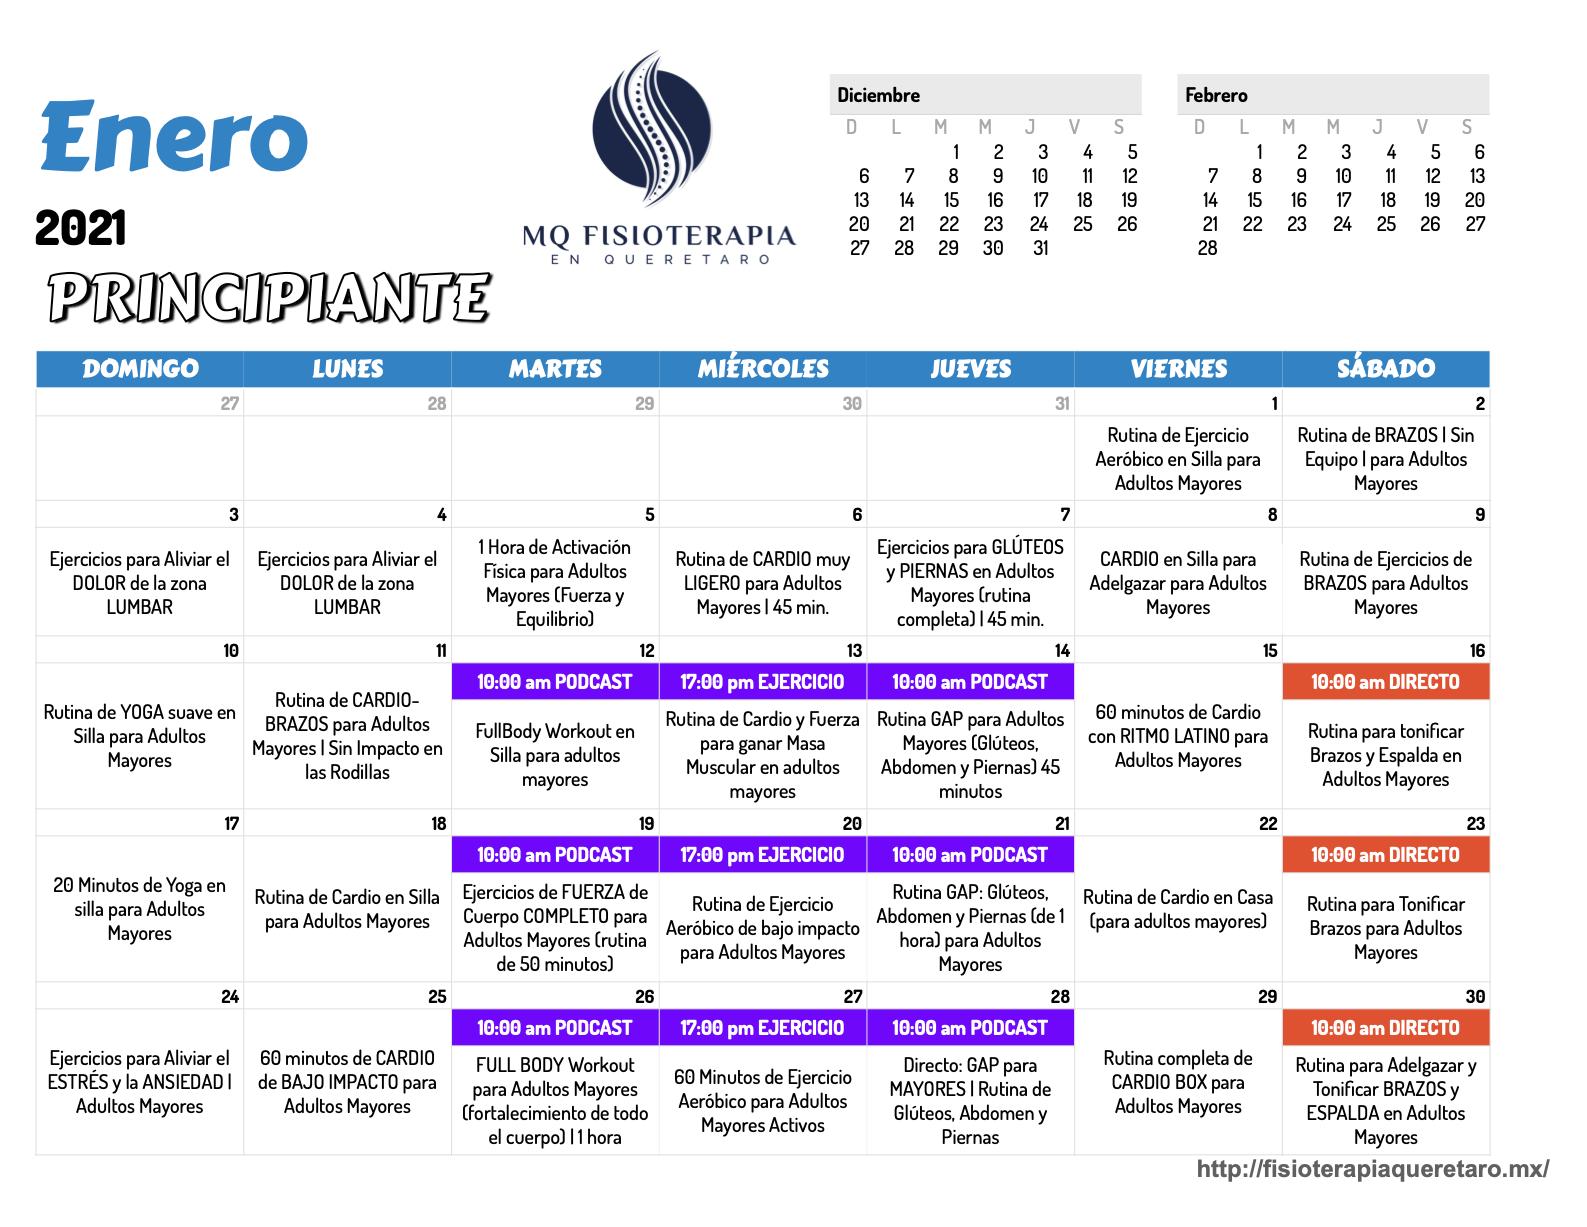 calendario-principiante-enero-2021